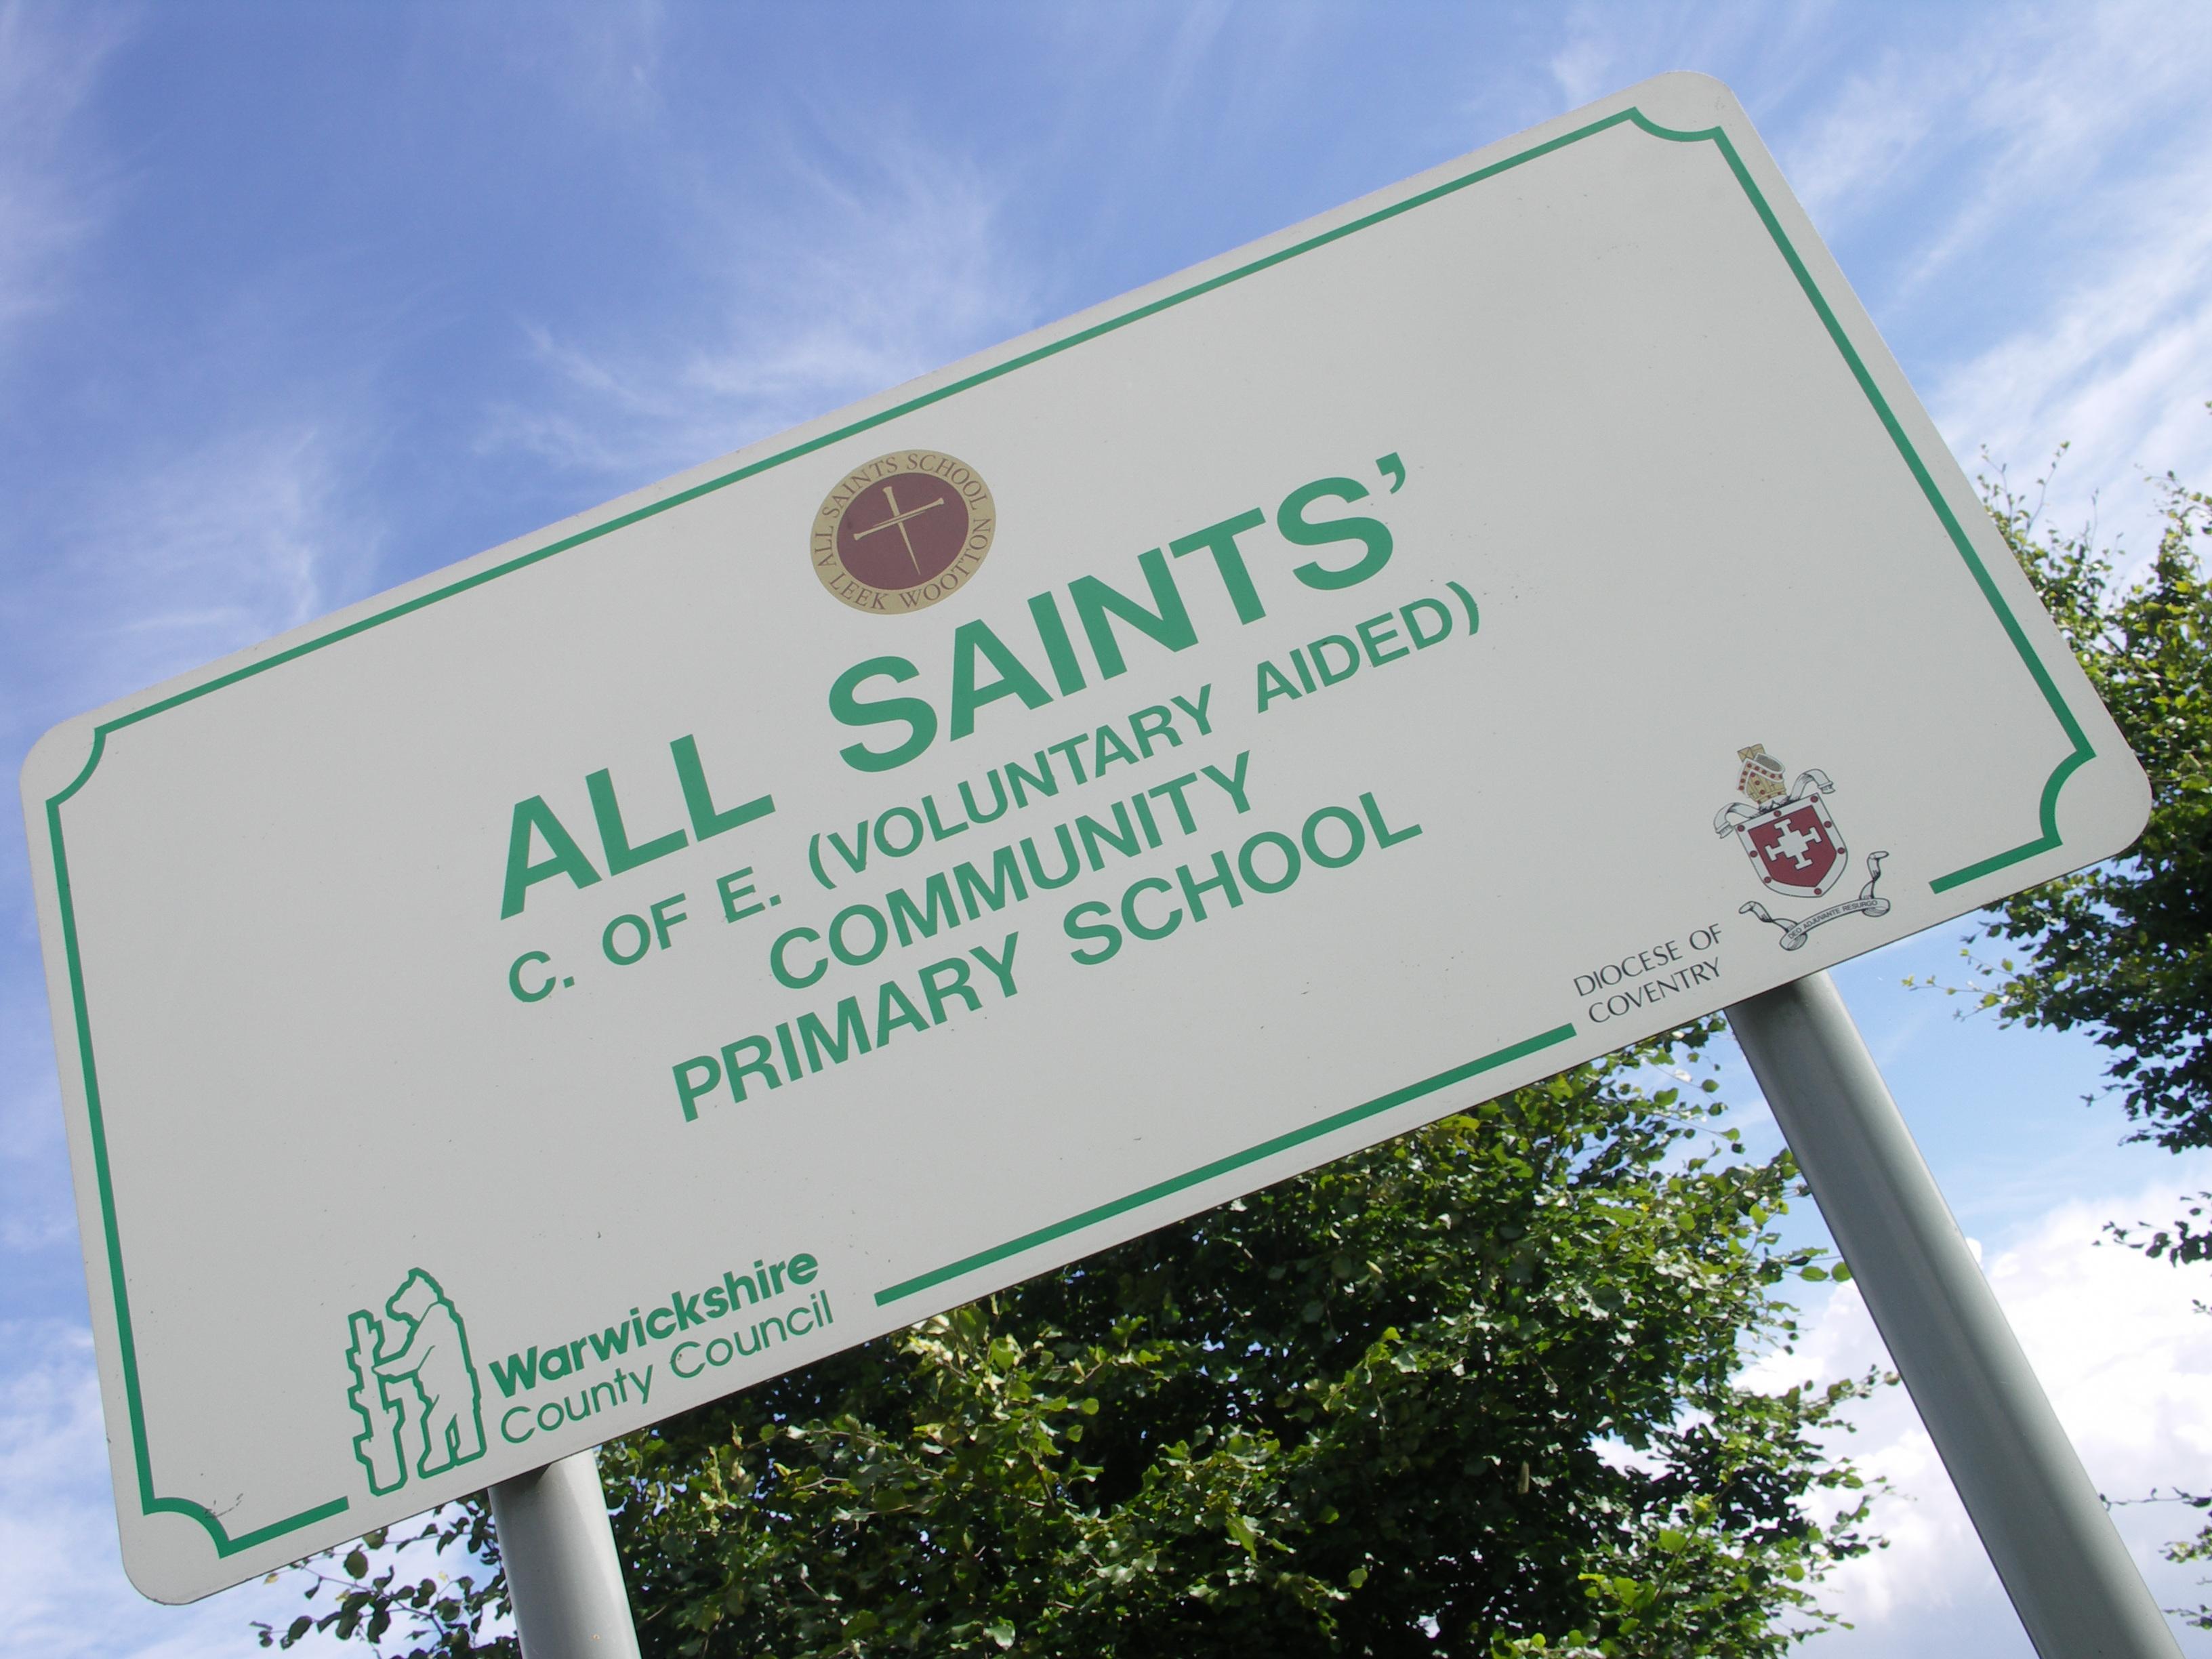 All Saints' C of E (VA) Primary School, Leek Wootton